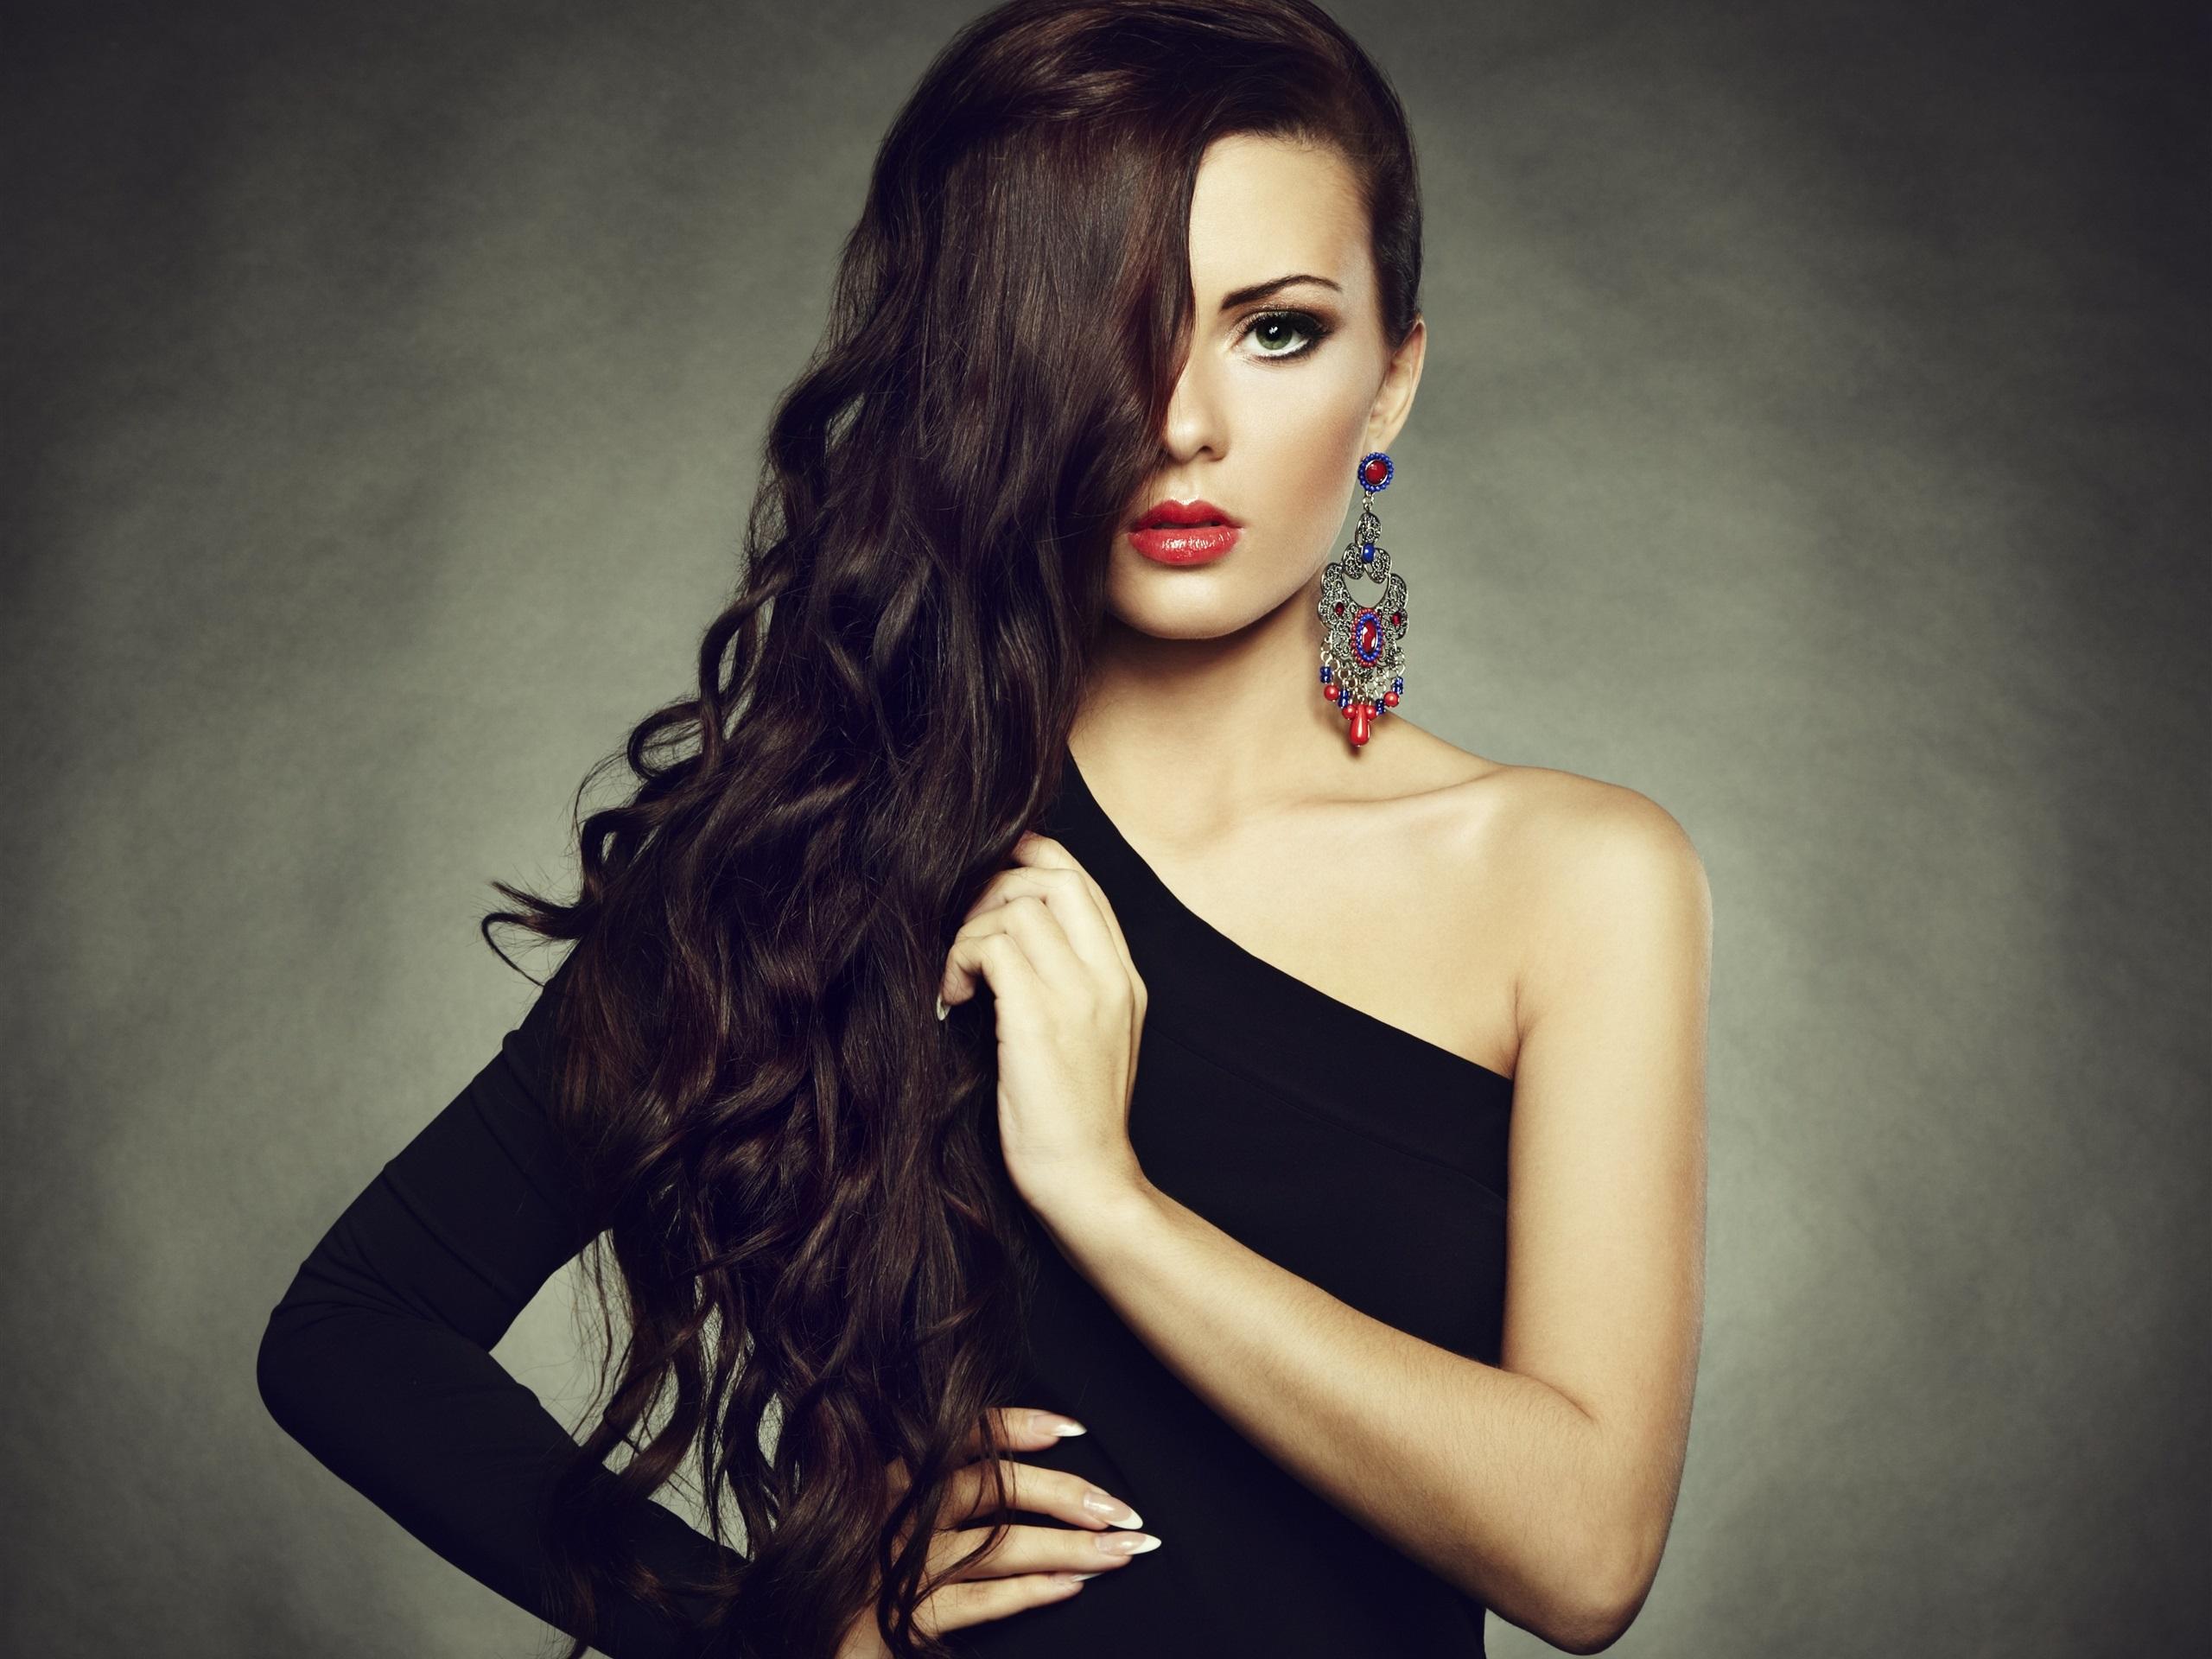 c35772d4e9 2560x1920px Long Hair Wallpapers - WallpaperSafari